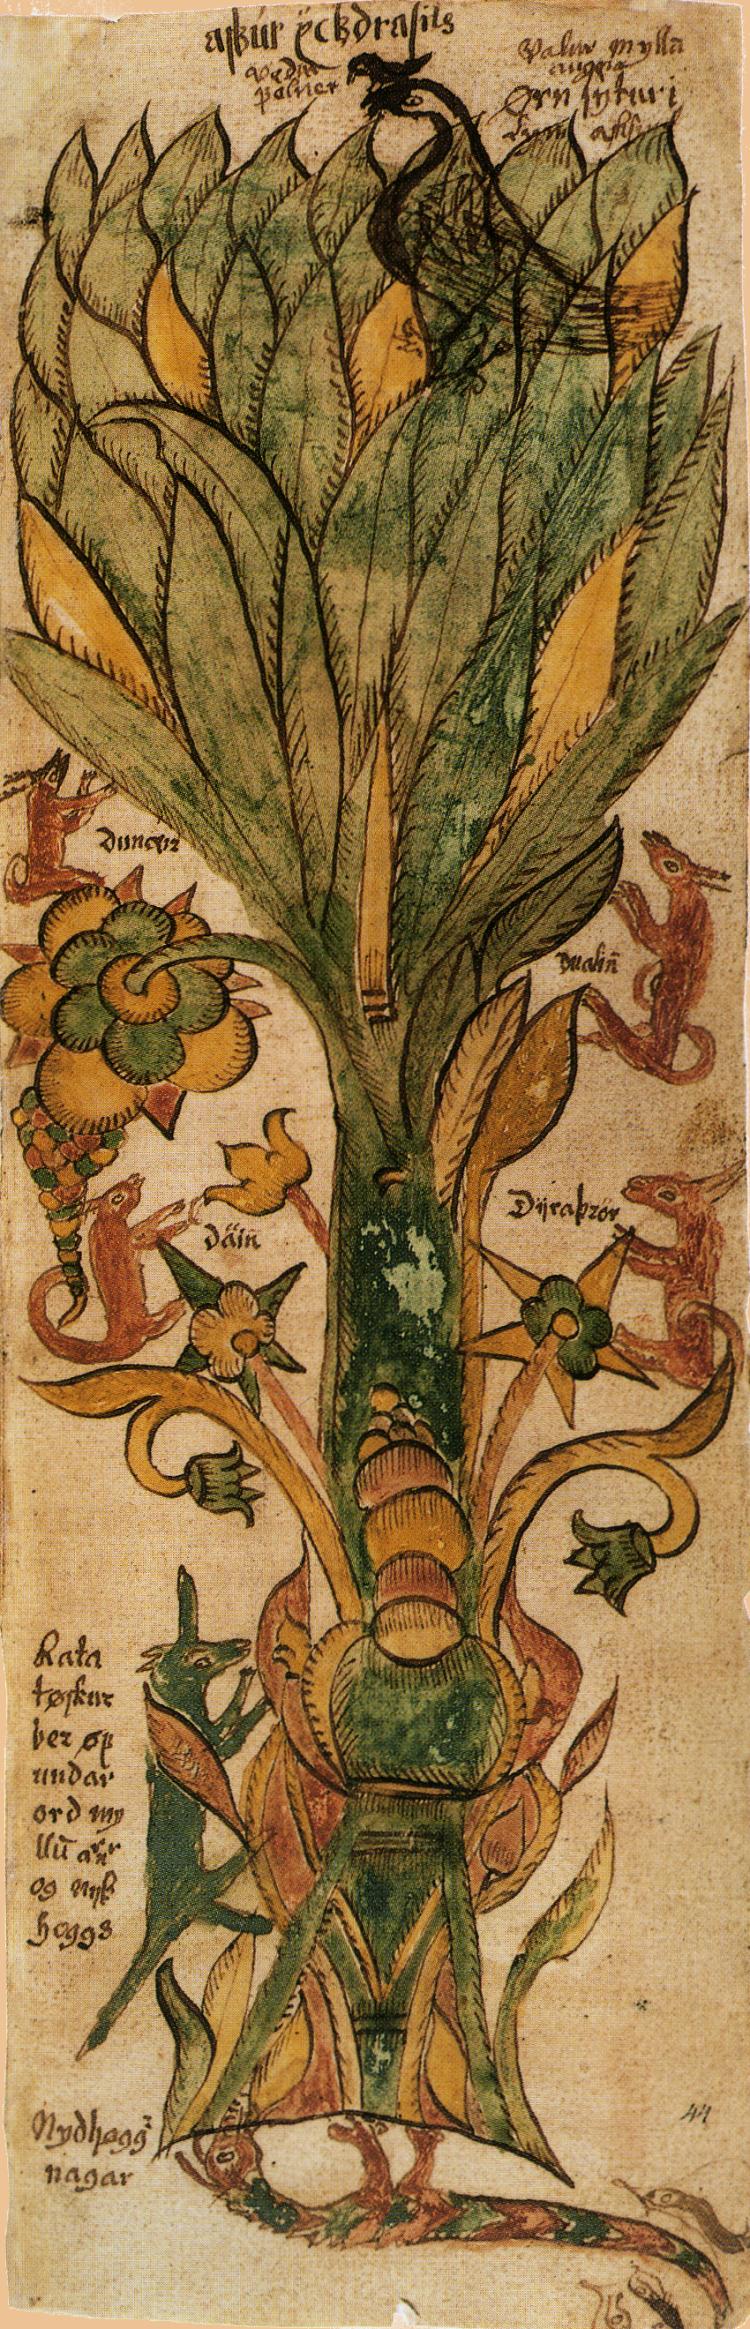 Mircea eliade wikipedia symbolism of the centeredit buycottarizona